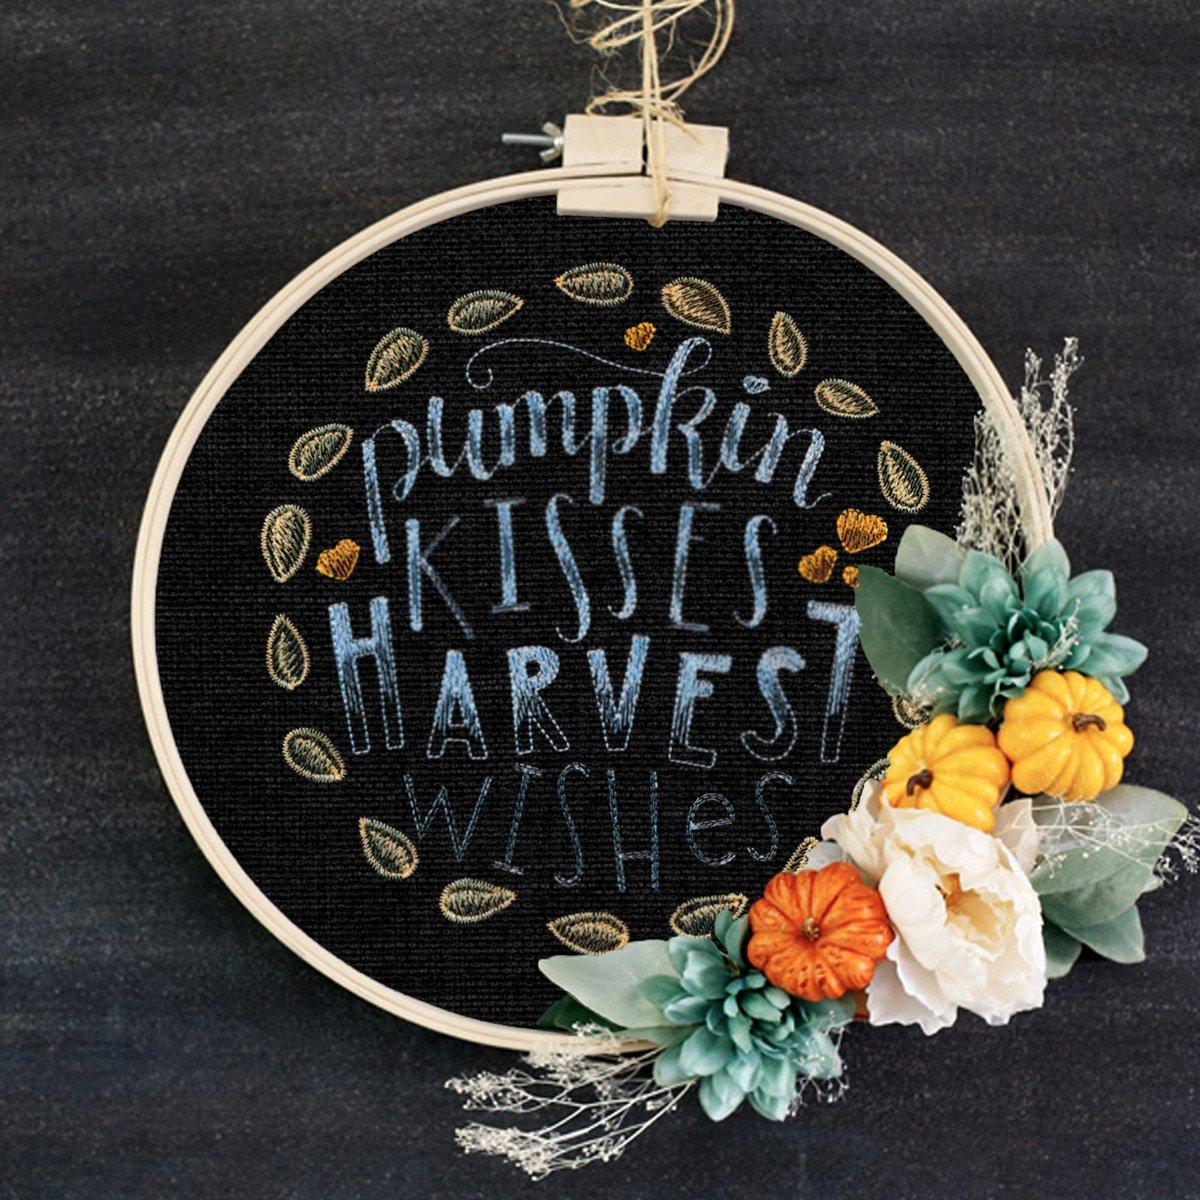 OESD Scissortail Stitches Pumpkin Kisses Machine Embroidery CD